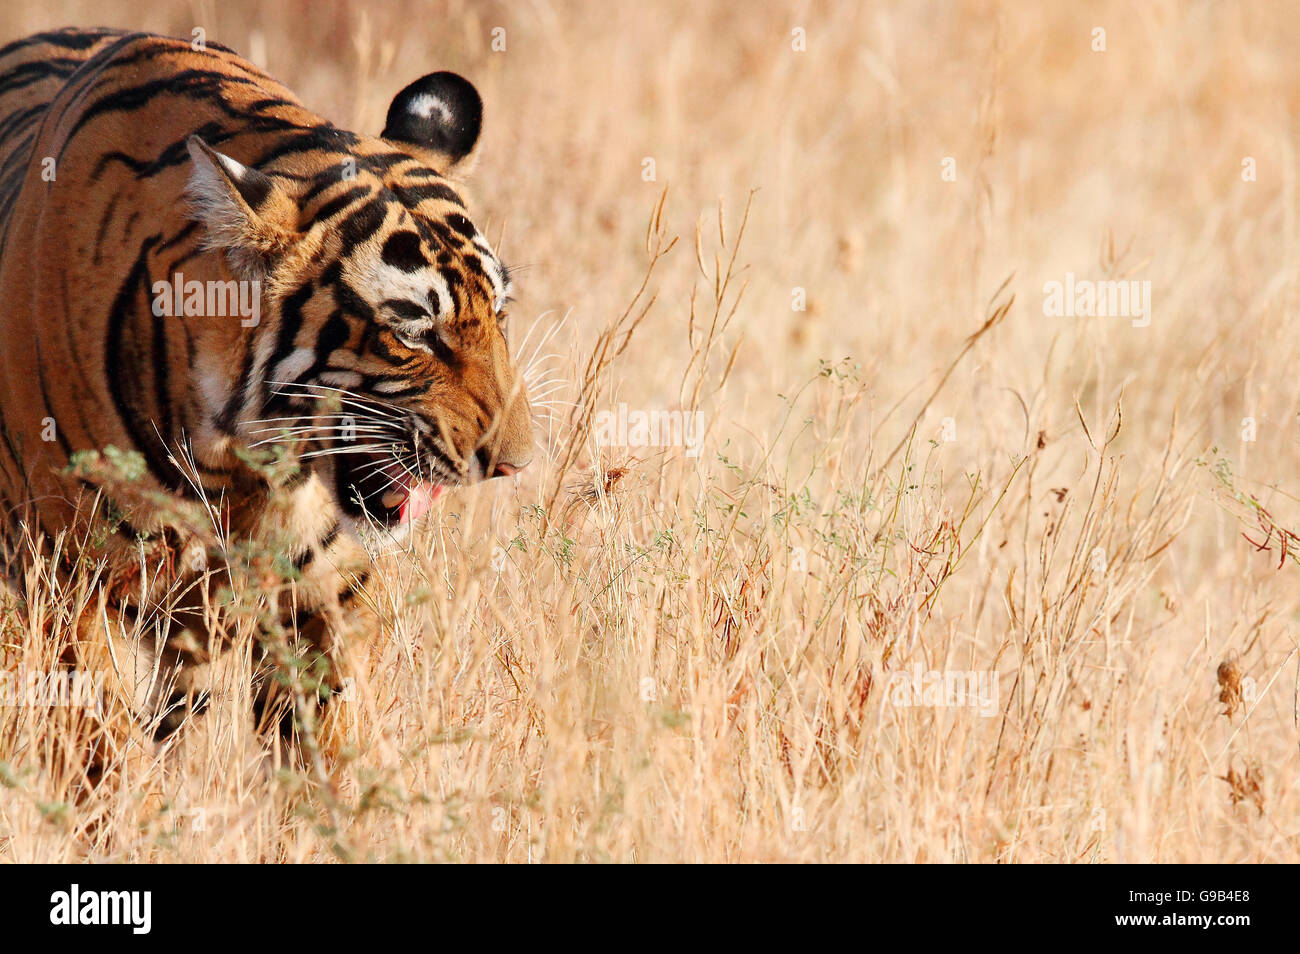 Snarling Royal Bengal Tiger - Stock Image